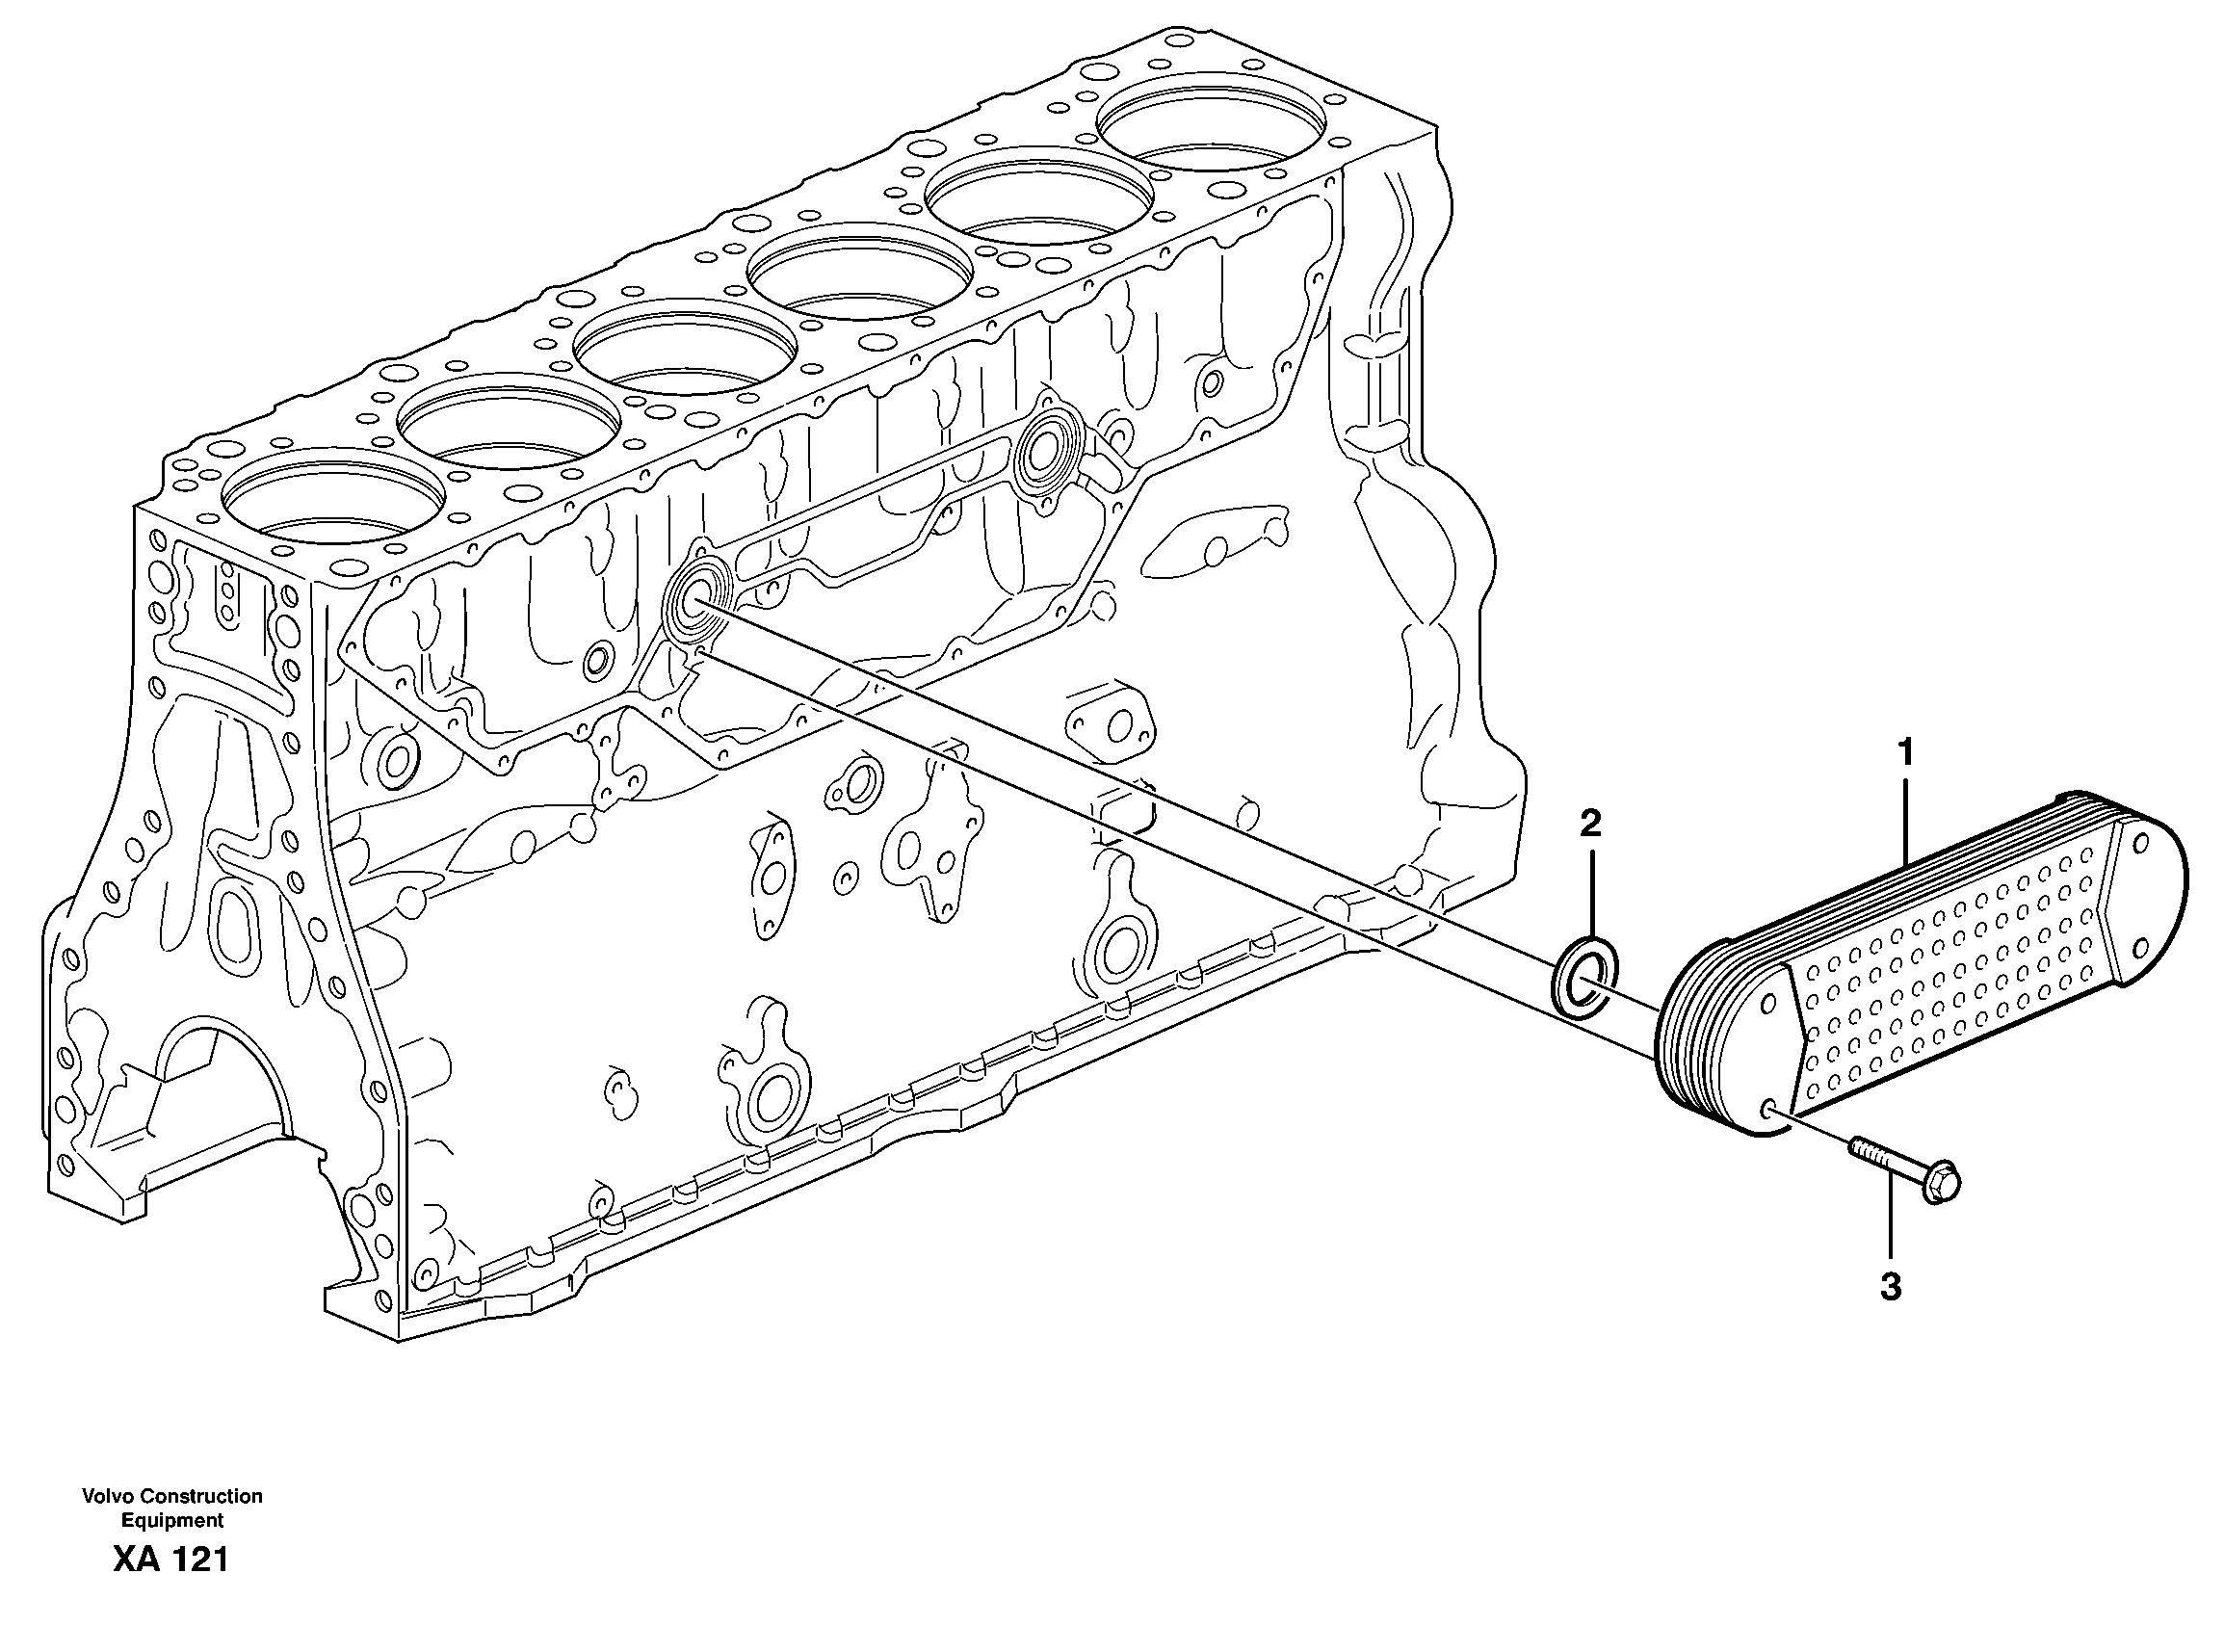 ekskavator-yag-sogutucu